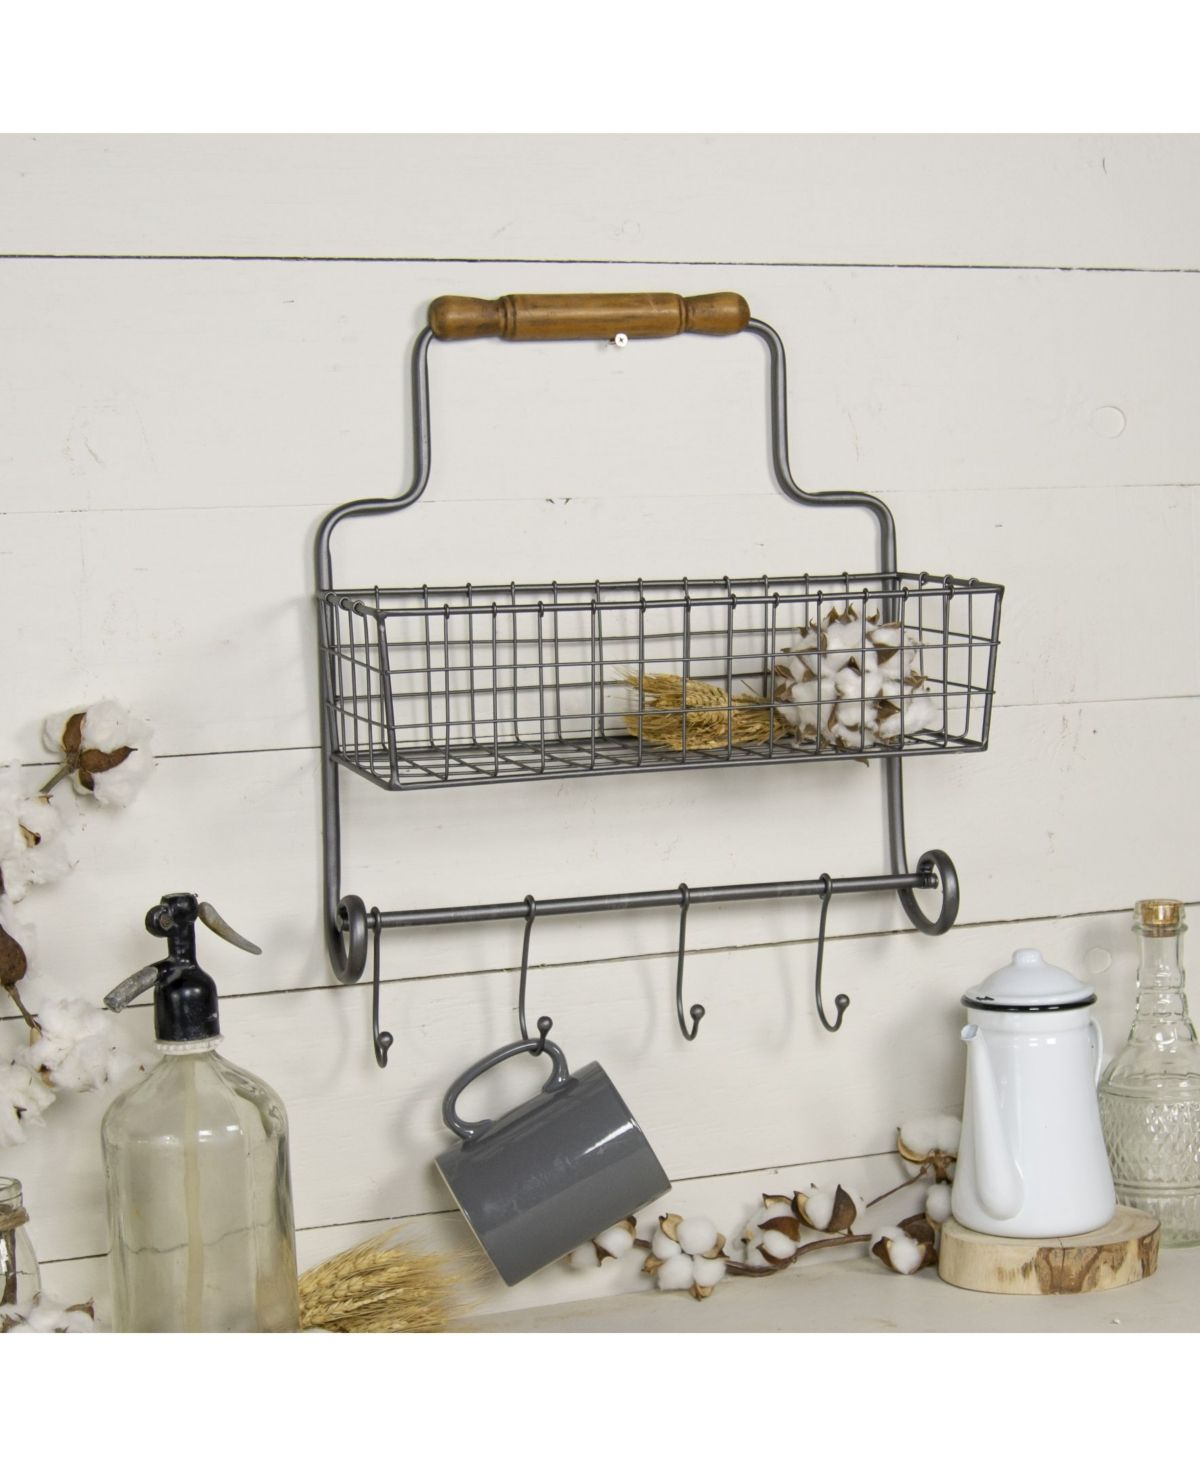 Vip Home Garden Metal Wall Basket With Hooks Reviews Macy S In 2020 Metal Wall Basket Baskets On Wall Hanging Mugs